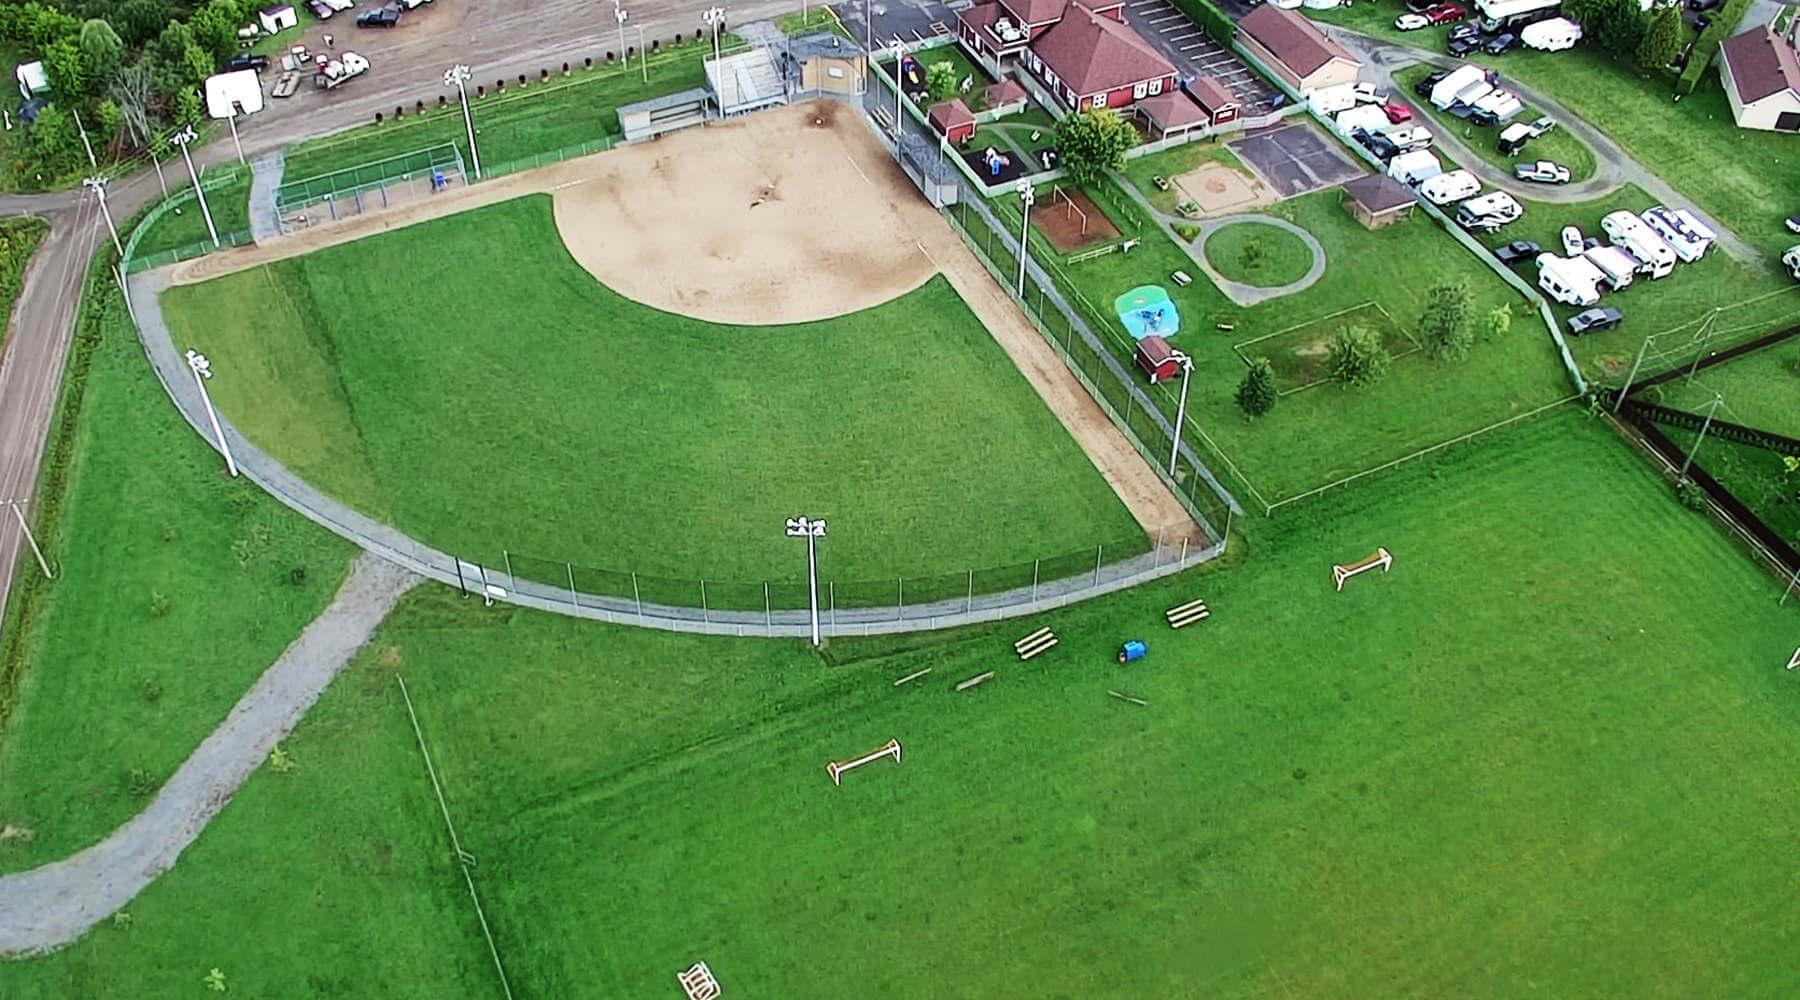 En-tête - Terrains sportifs - Ville de Saint-Tite